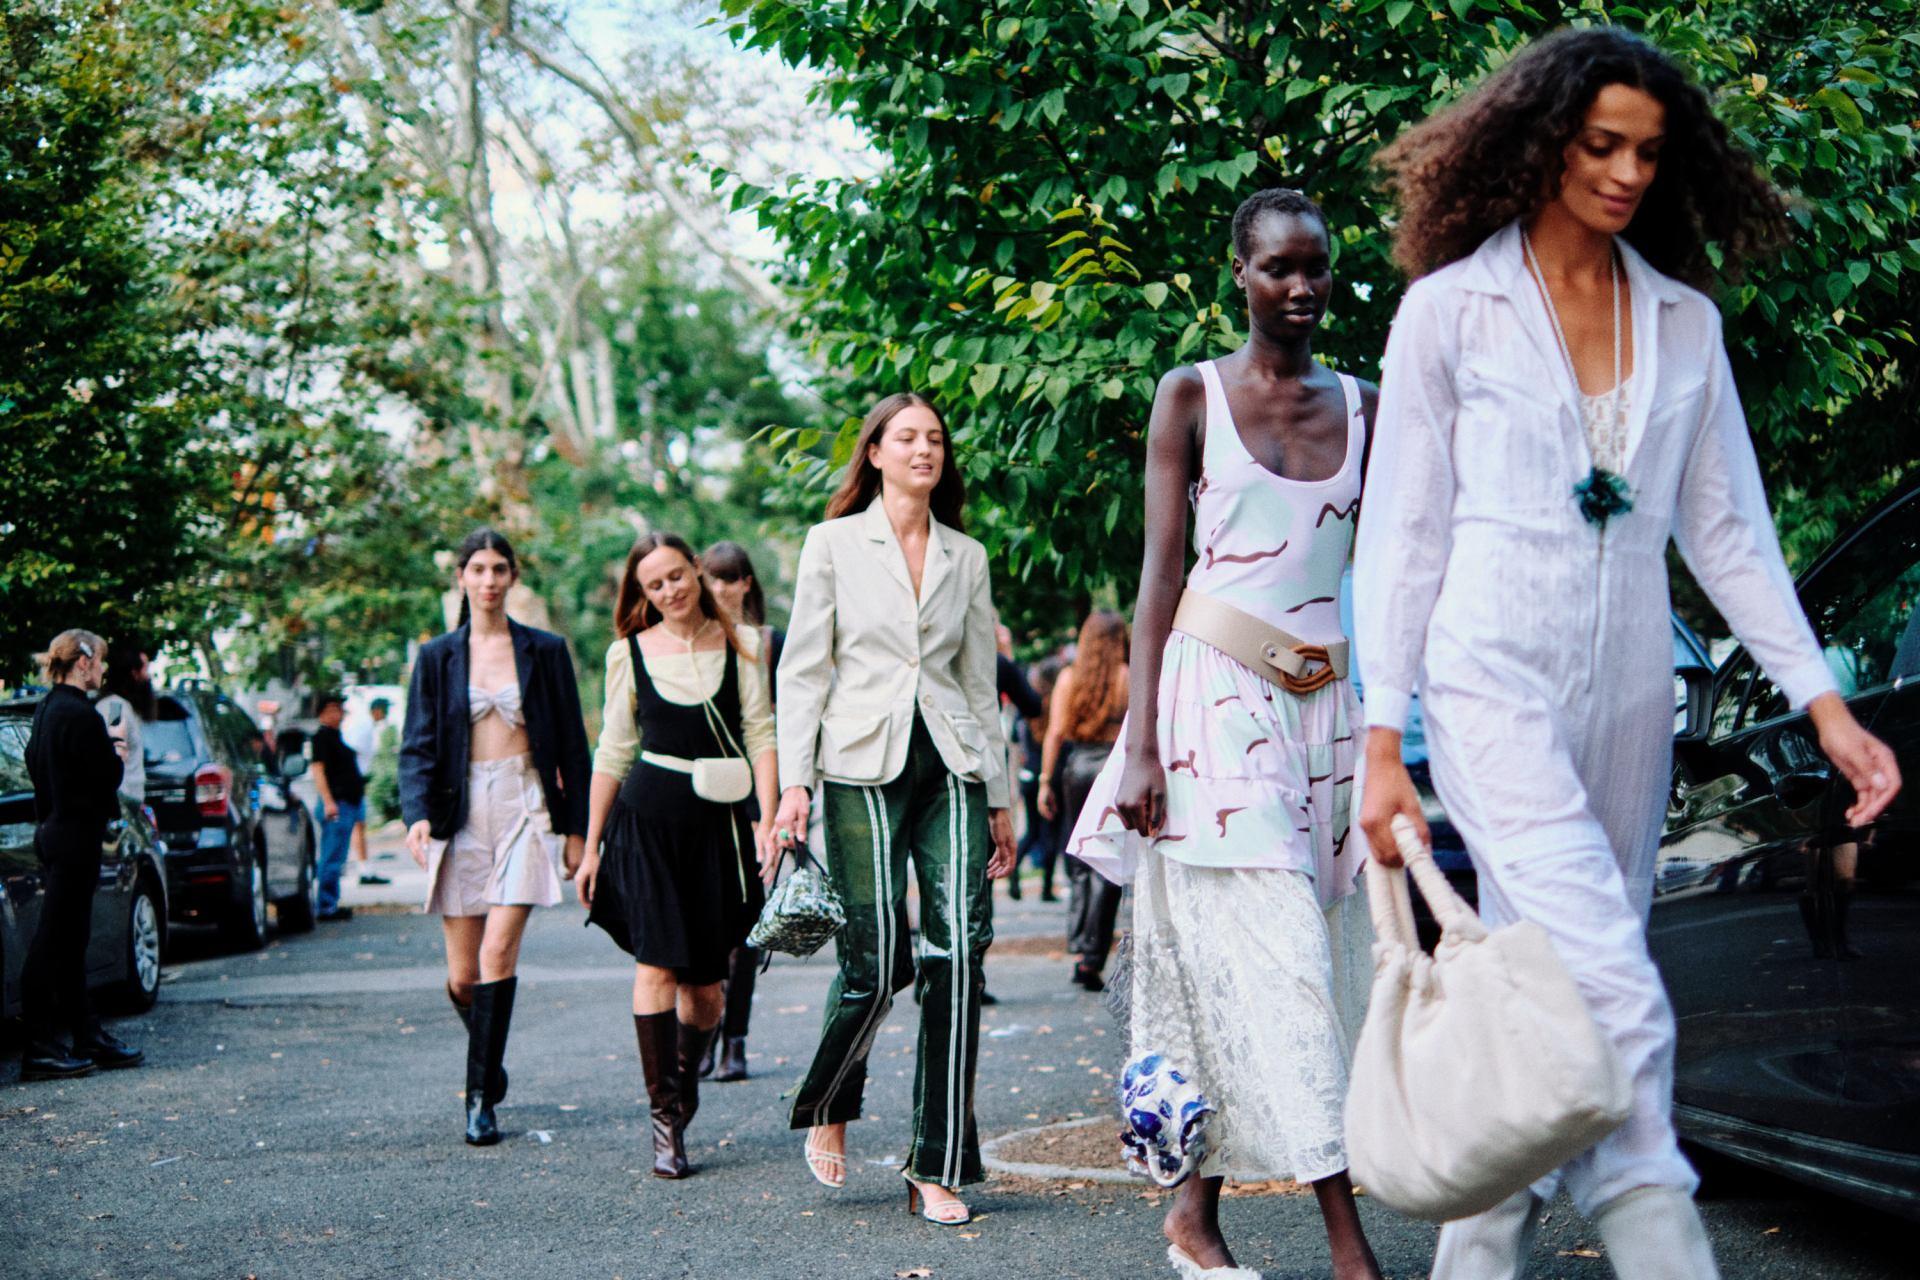 Vogue meets Maryam Nassir Zadeh, New York Fashion Week's next-gen star